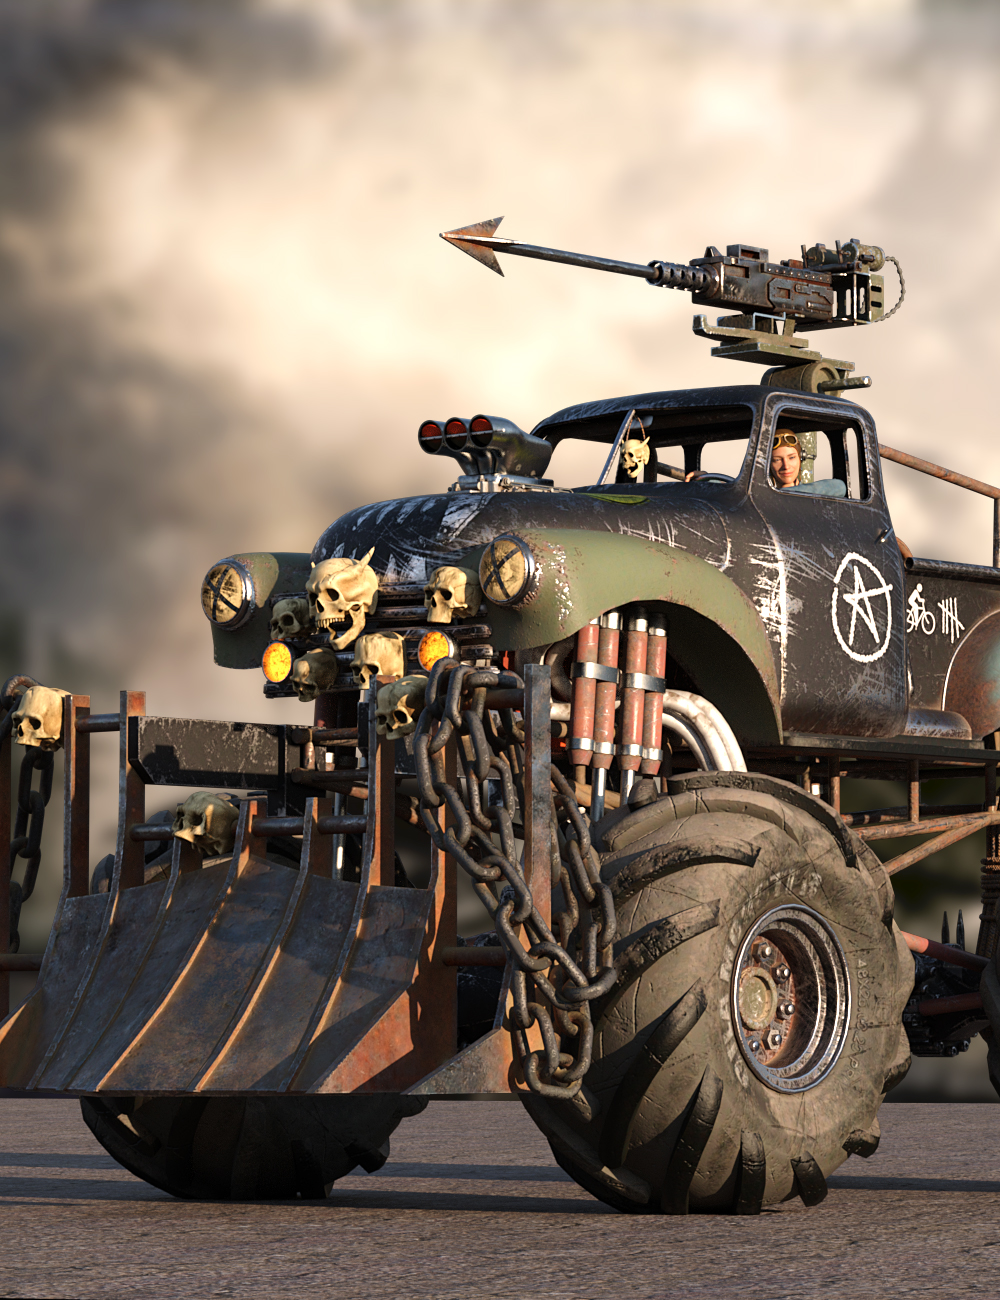 Gila Destructive Truck by: DarkEdgeDesign, 3D Models by Daz 3D